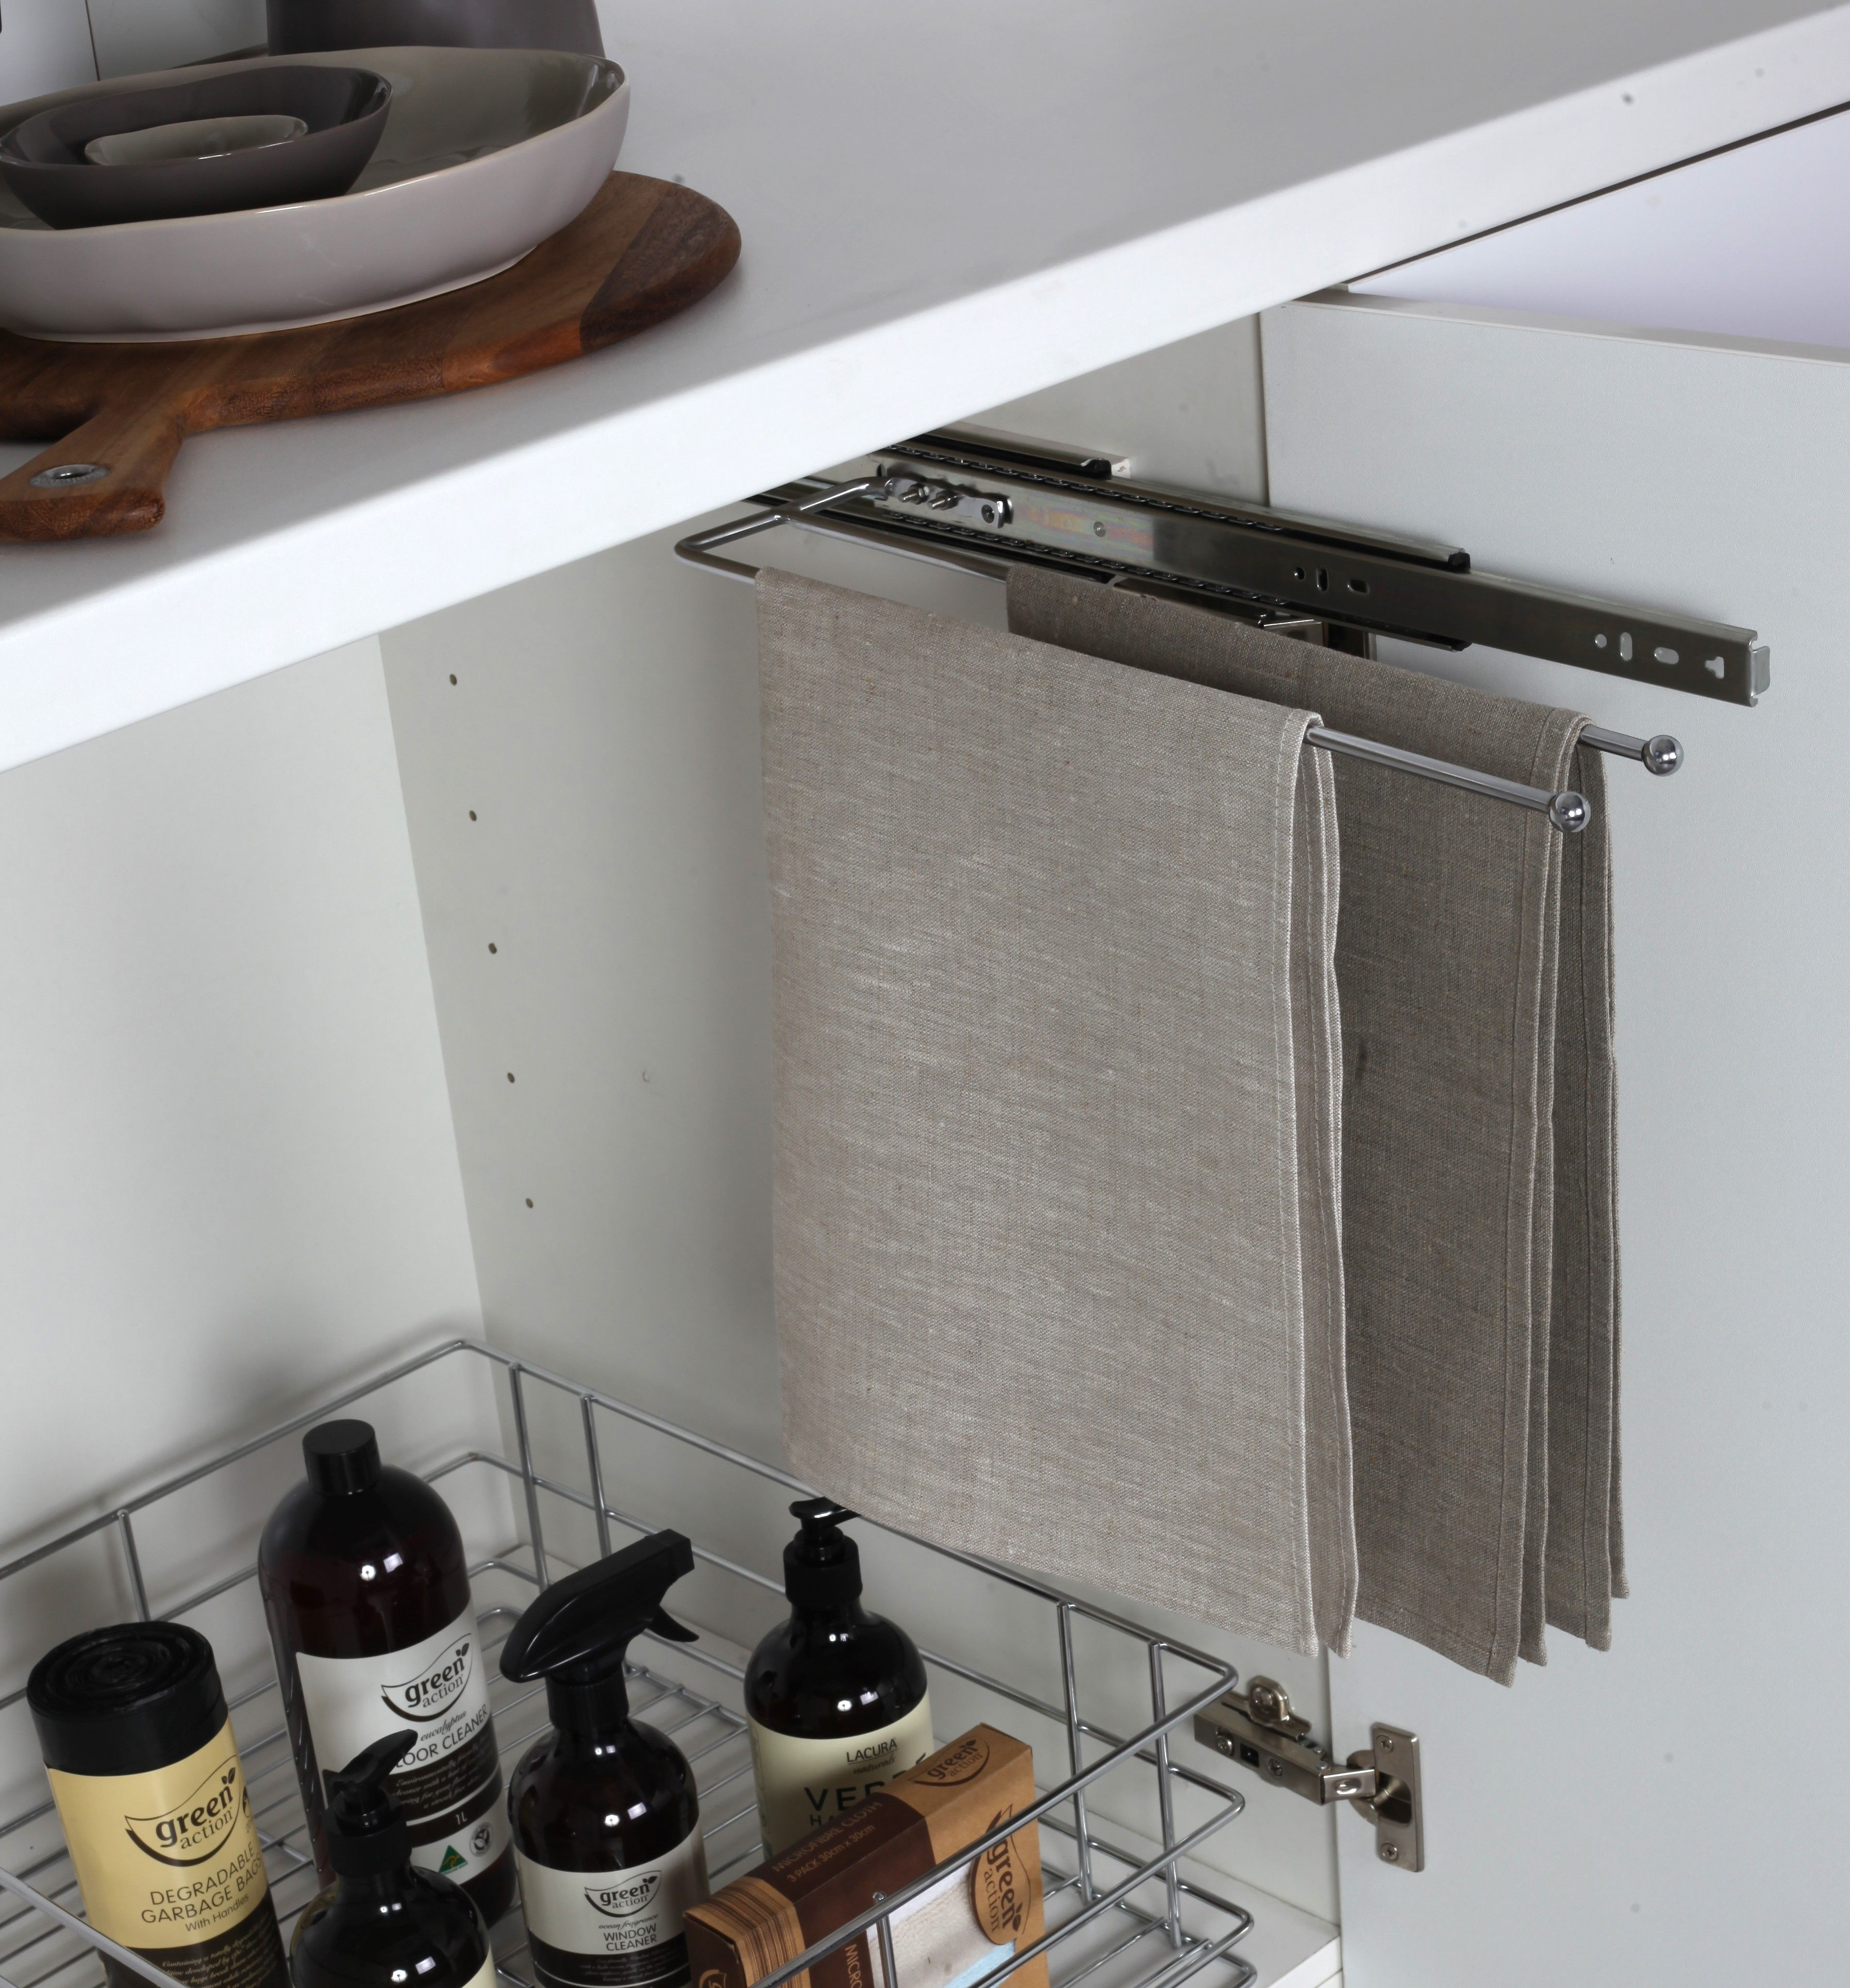 Tea Towel Slide Stainless Steel Wire Tansel Storage Under Sink Storage Sink Storage Wire Shelving